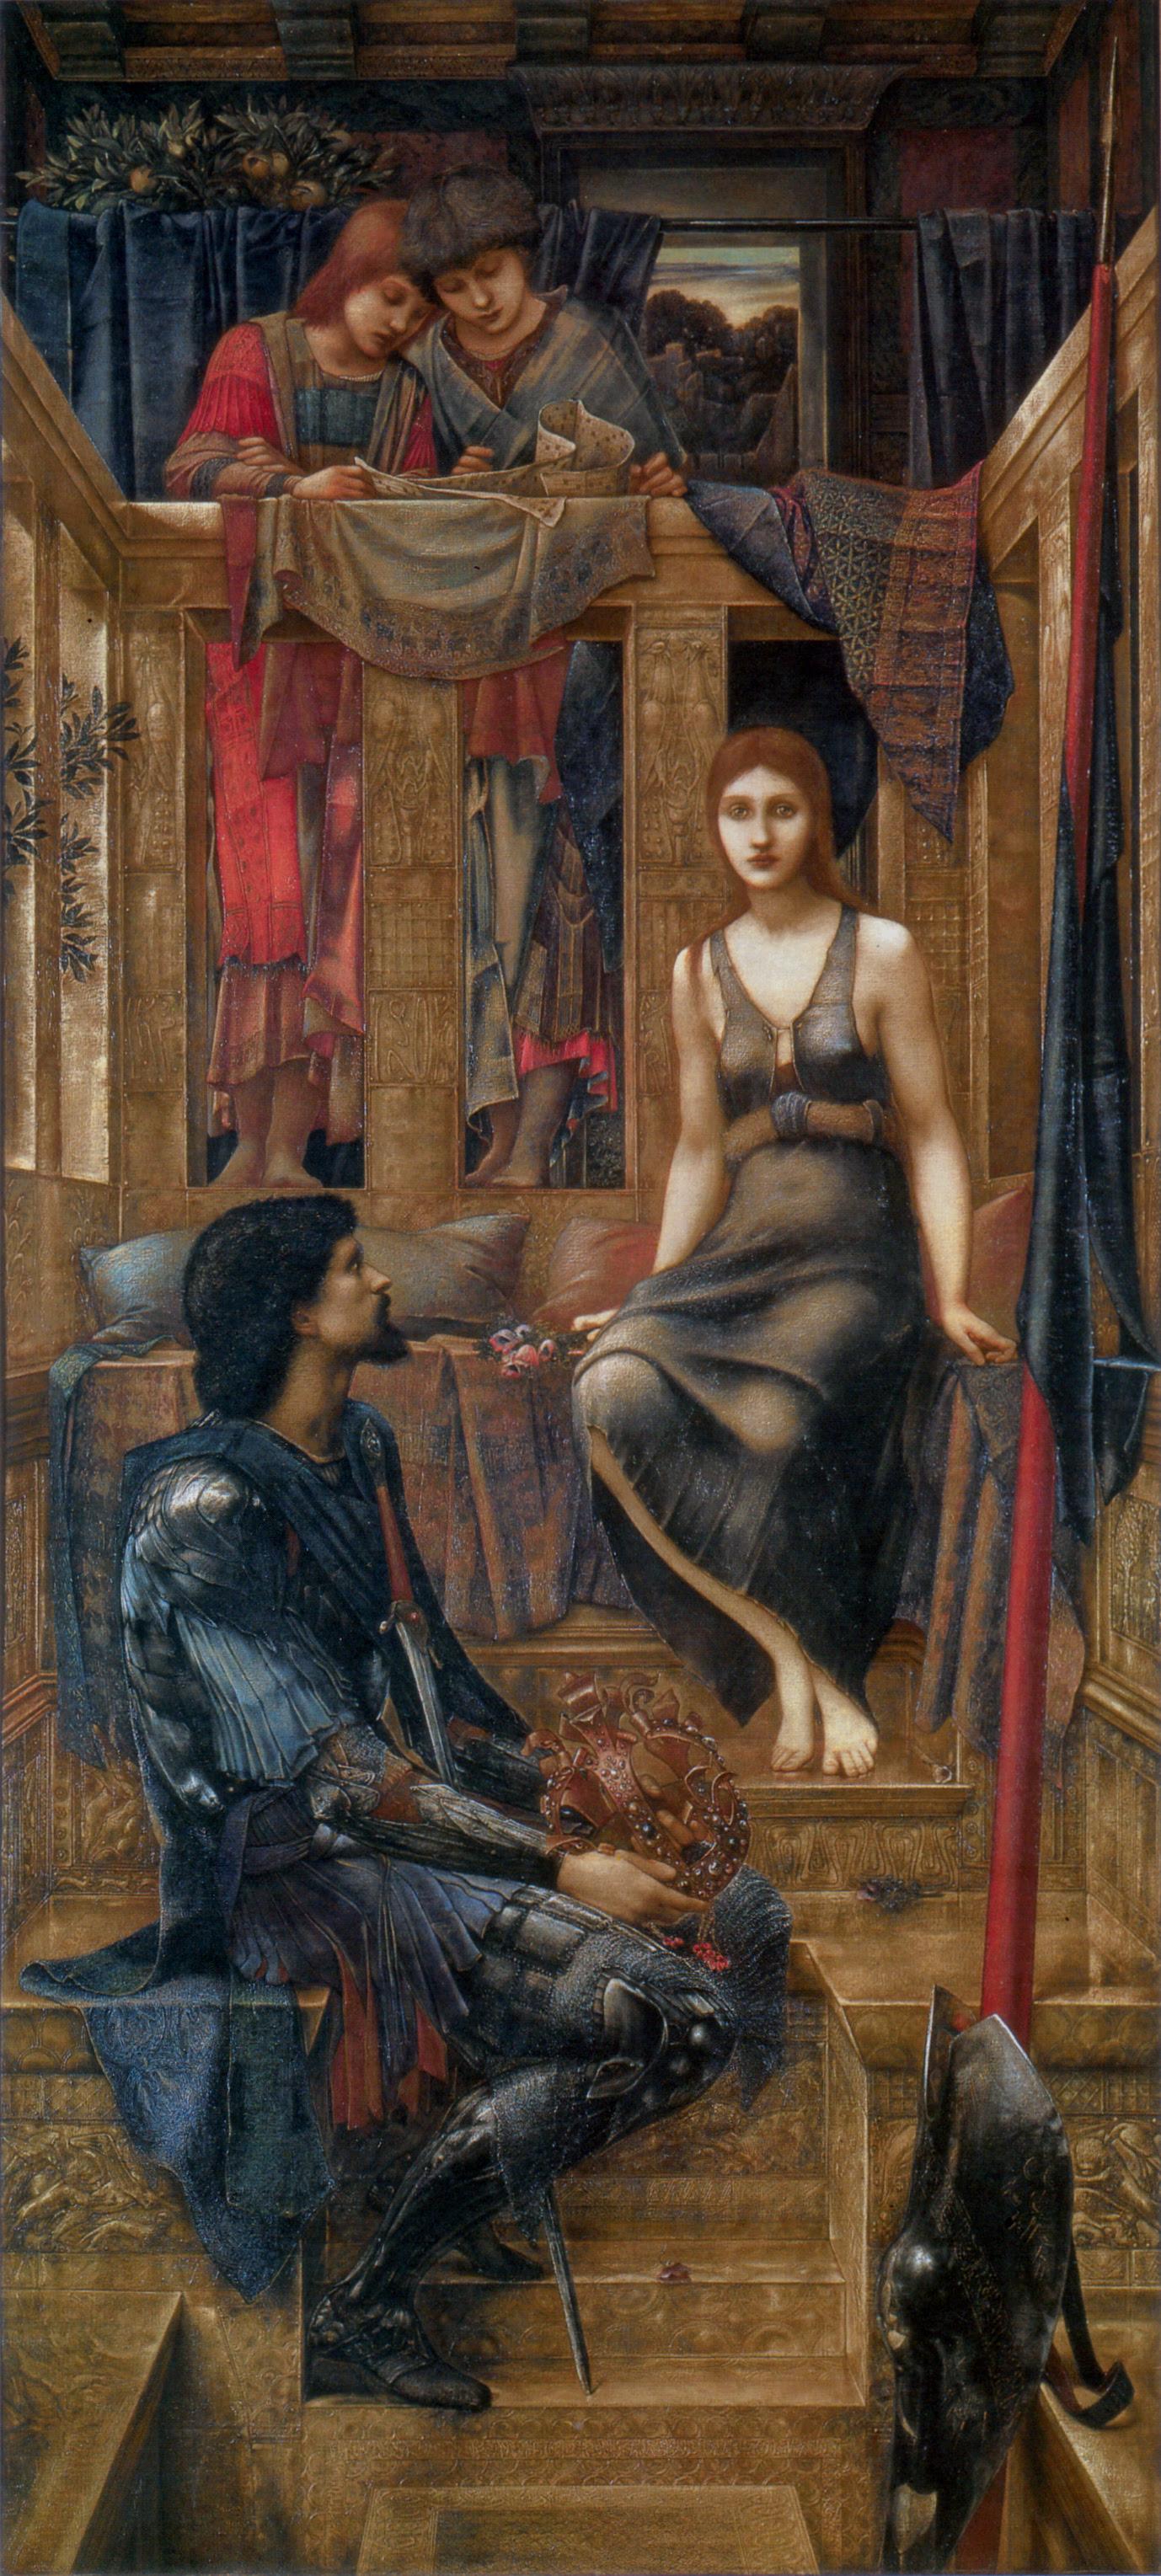 King Cophetua and the maid